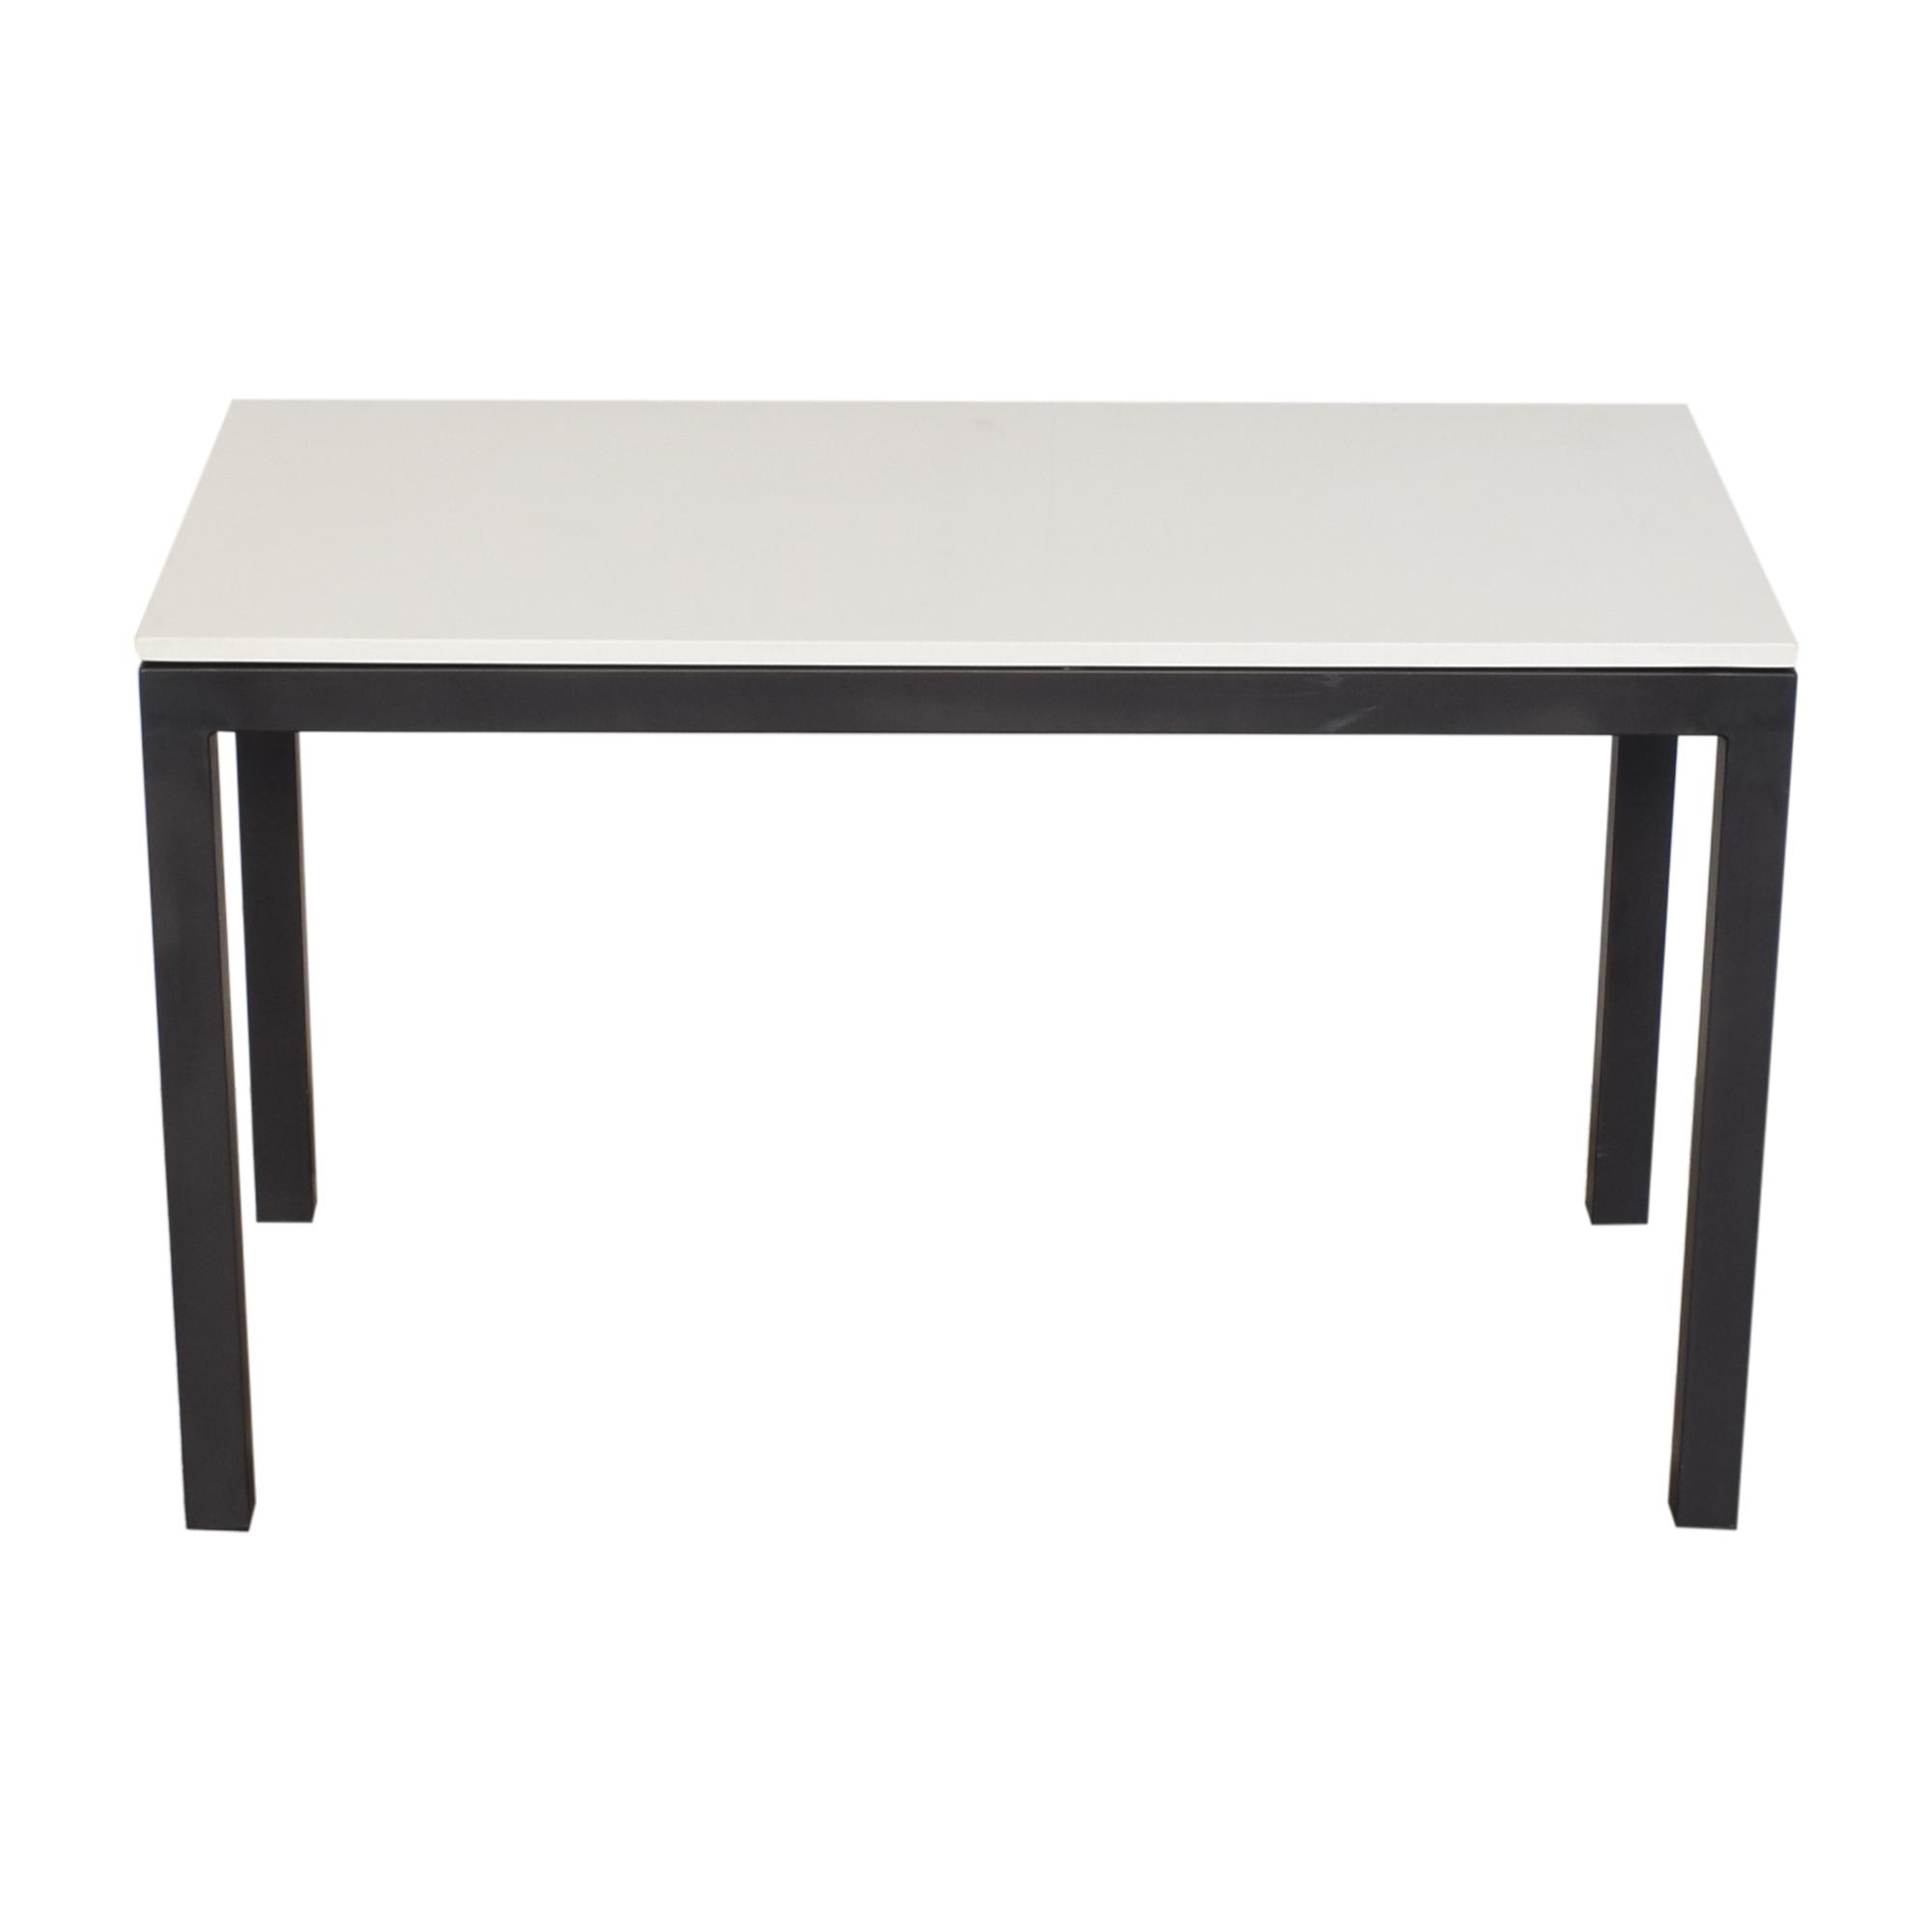 shop Room & Board Parsons Desk Room & Board Dinner Tables